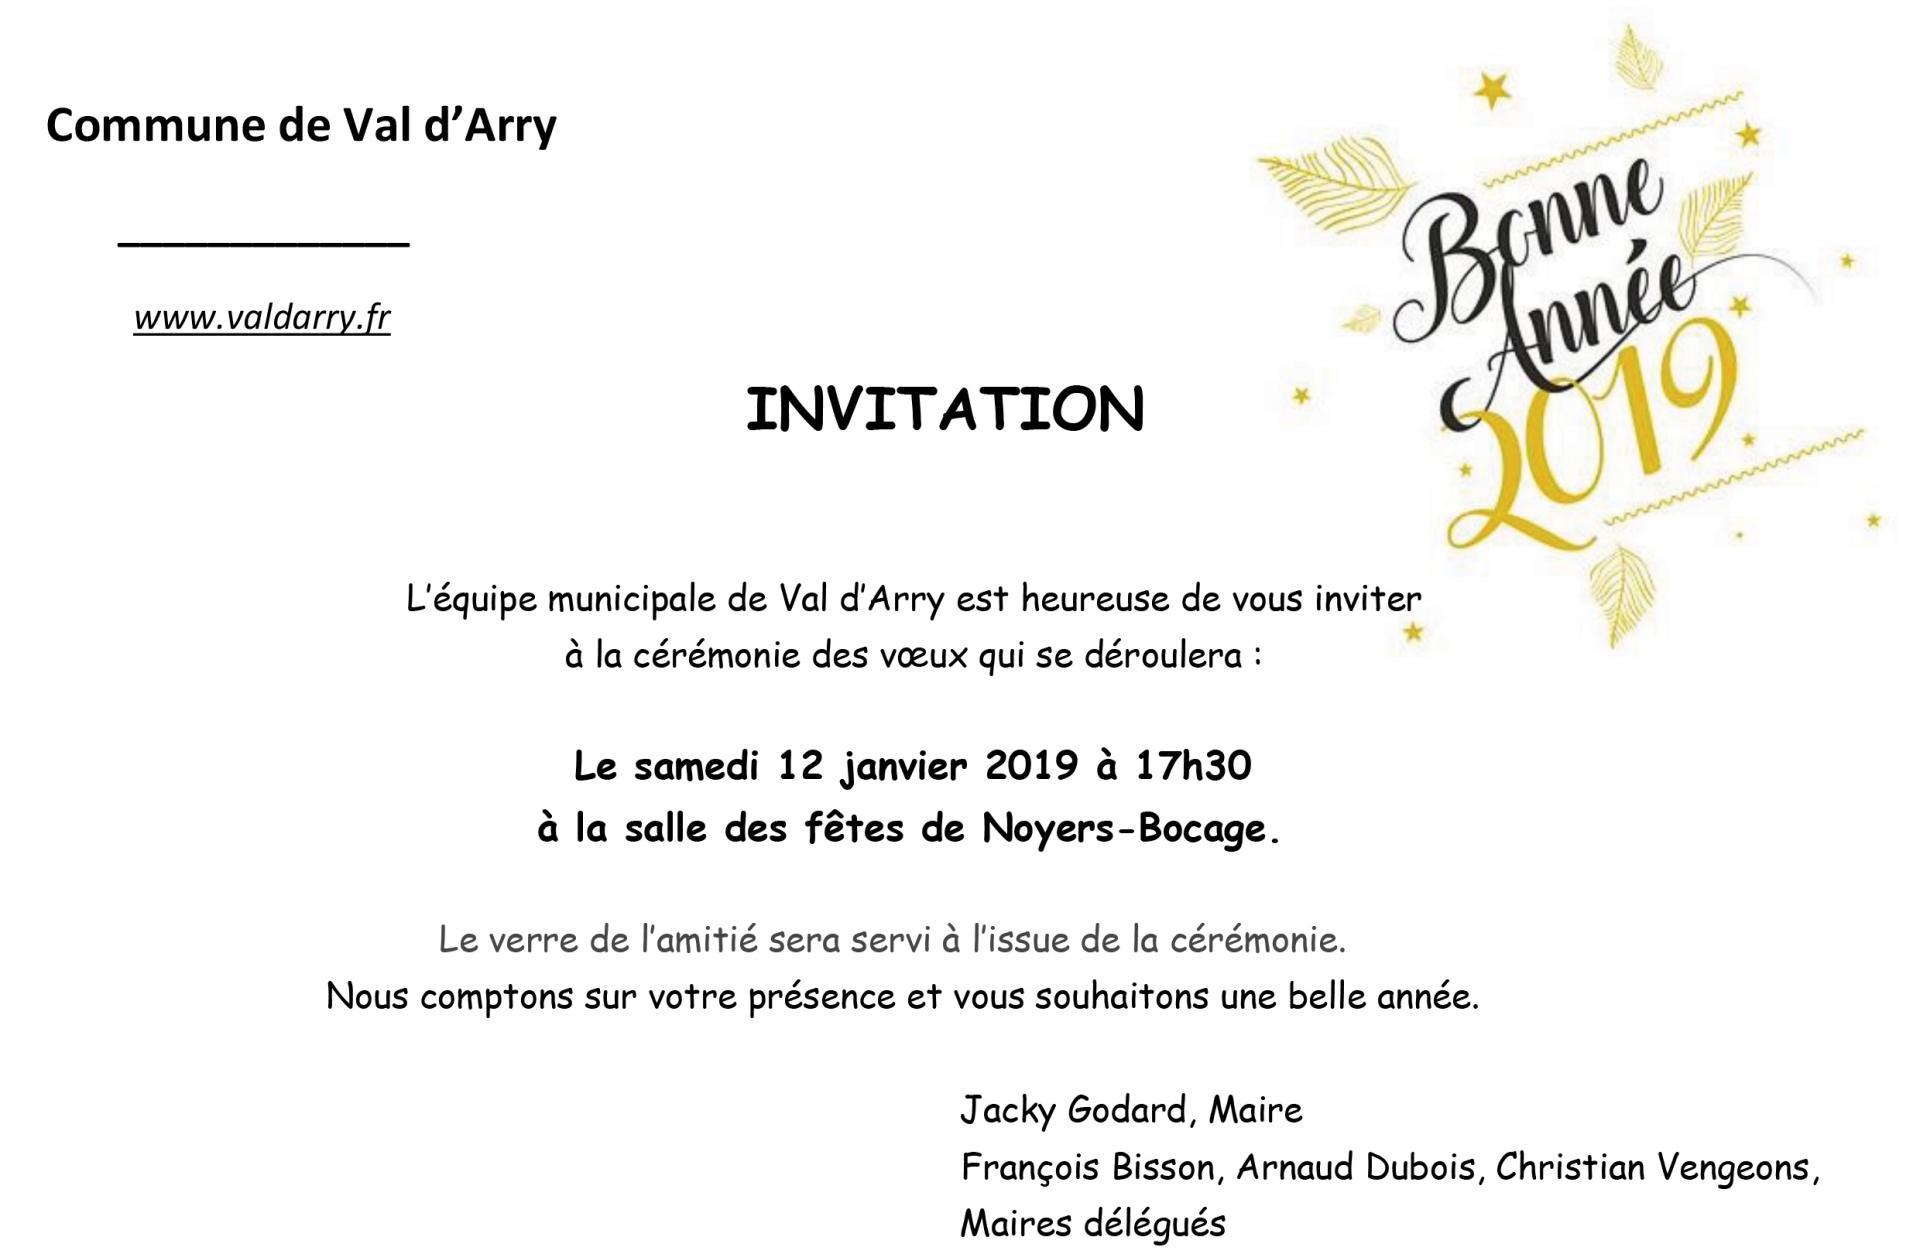 Invitation voeux 2019